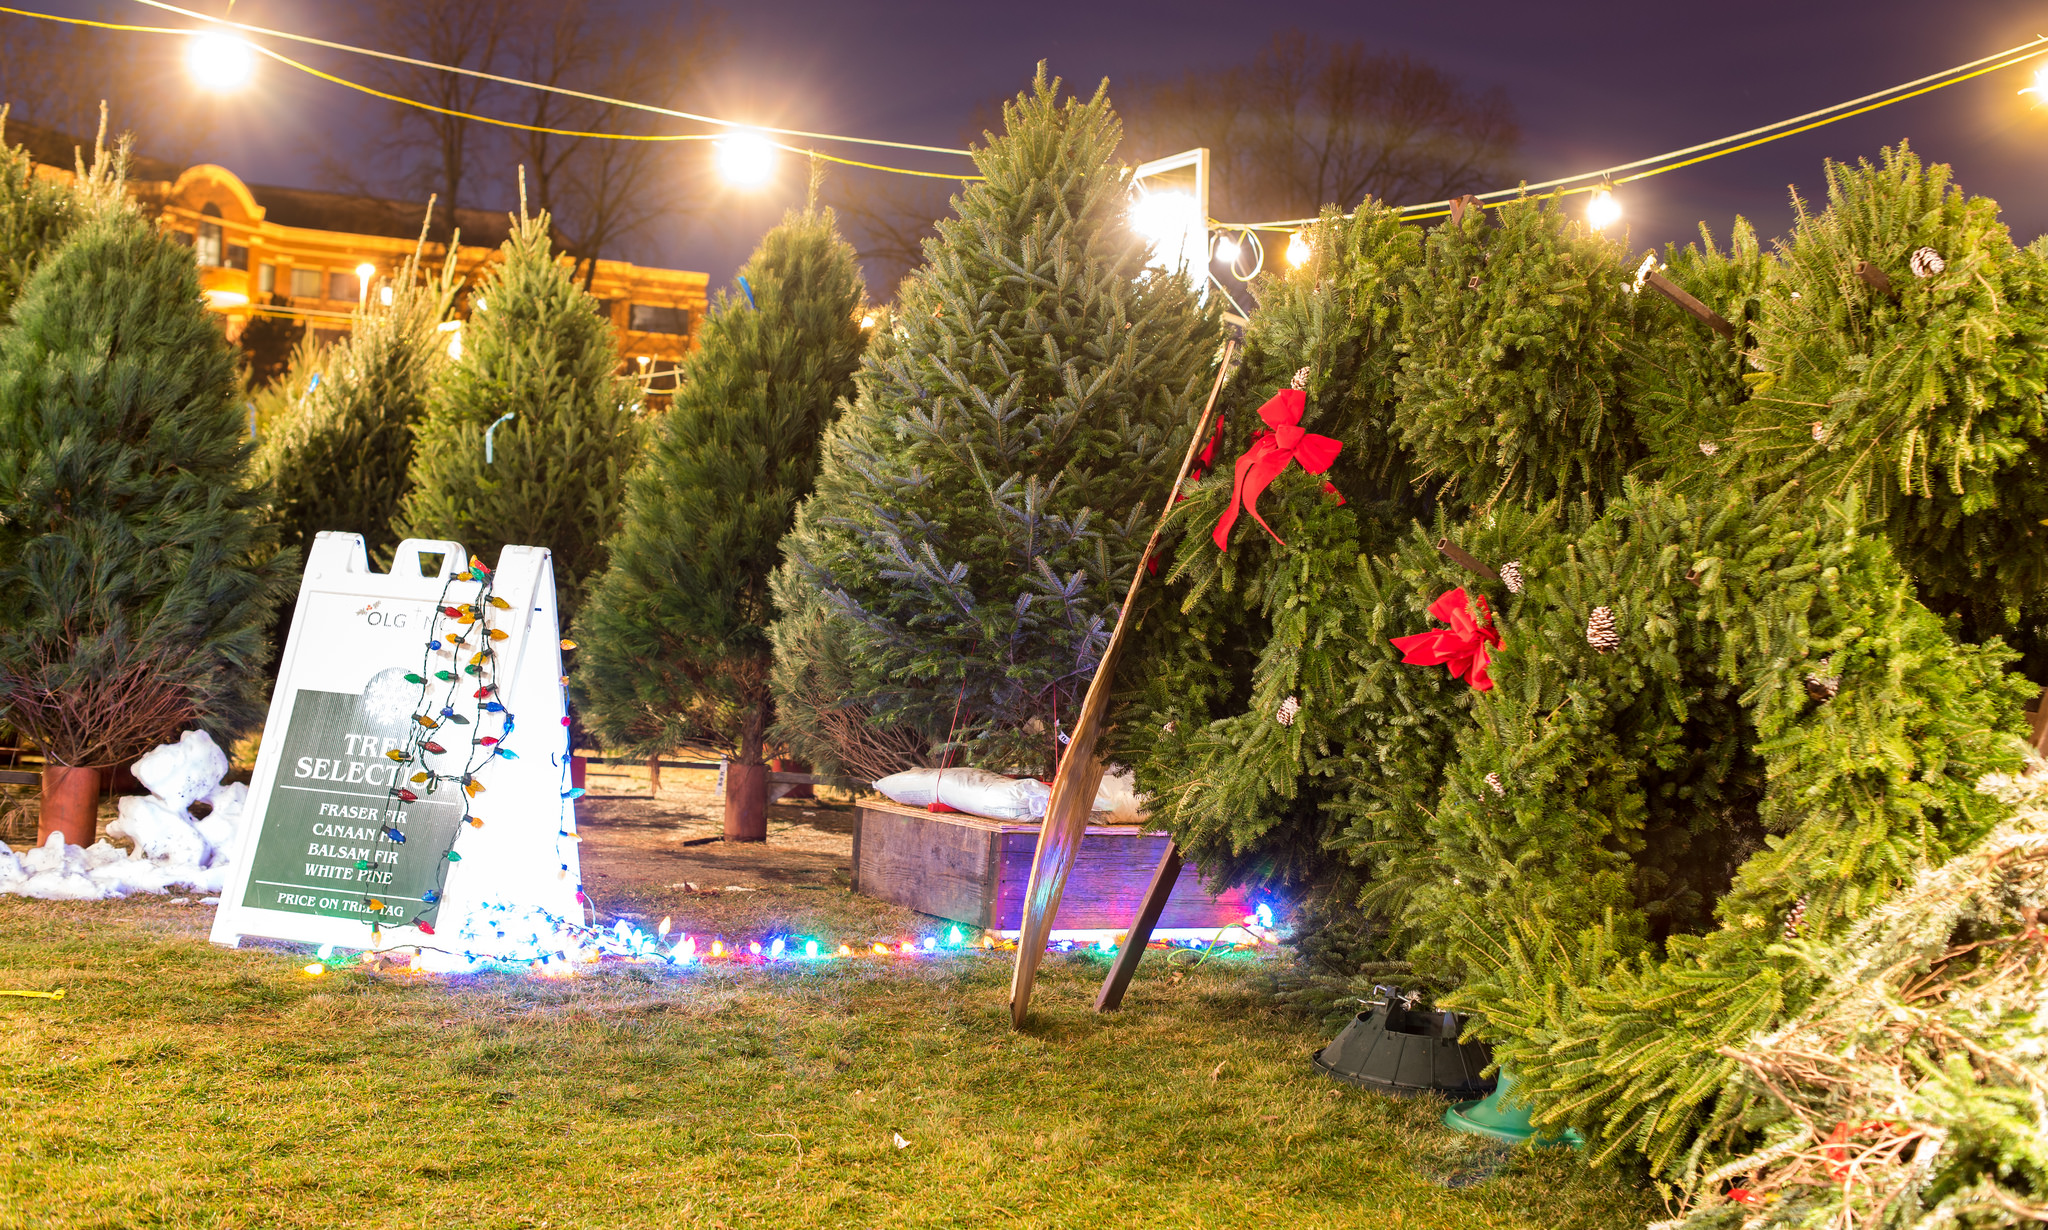 OLG Christmas Tree Lot OPEN! - Sponsored by OLG Men's Club